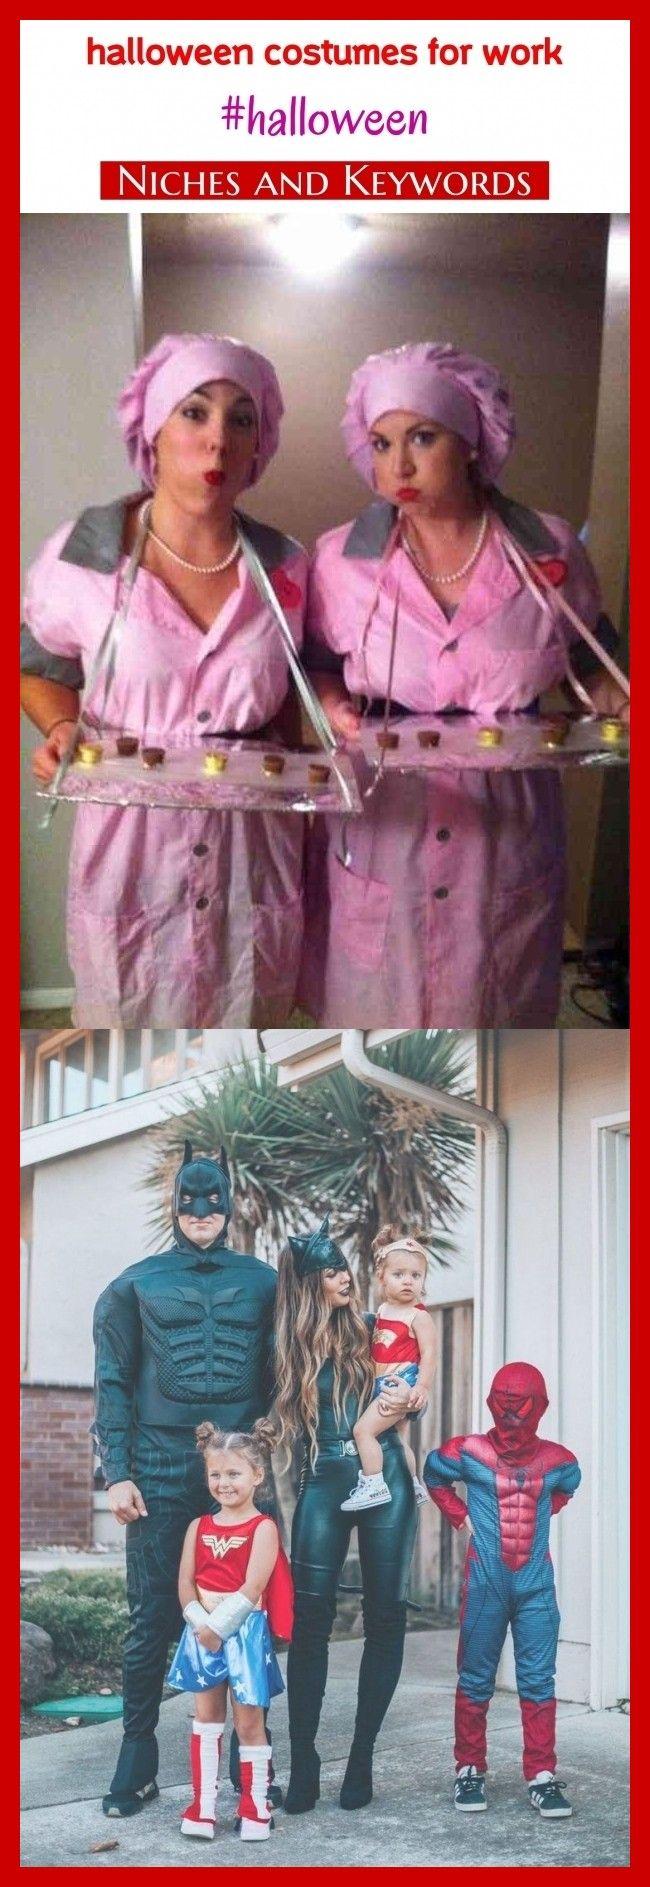 Halloween costumes for work #halloween #seo #holiday&party. halloween costumes women, halloween costumes couples, halloween costumes diy, halloween costumes for work, halloween costumes kids, halloween costumes college, halloween costumes for teens, easy halloween costumes, group halloween costumes, creative halloween costumes, bff halloween costumes, scary halloween costumes, hot halloween costumes, cute halloween costumes, funny halloween costumes, family hal. #bffhalloweencostumes